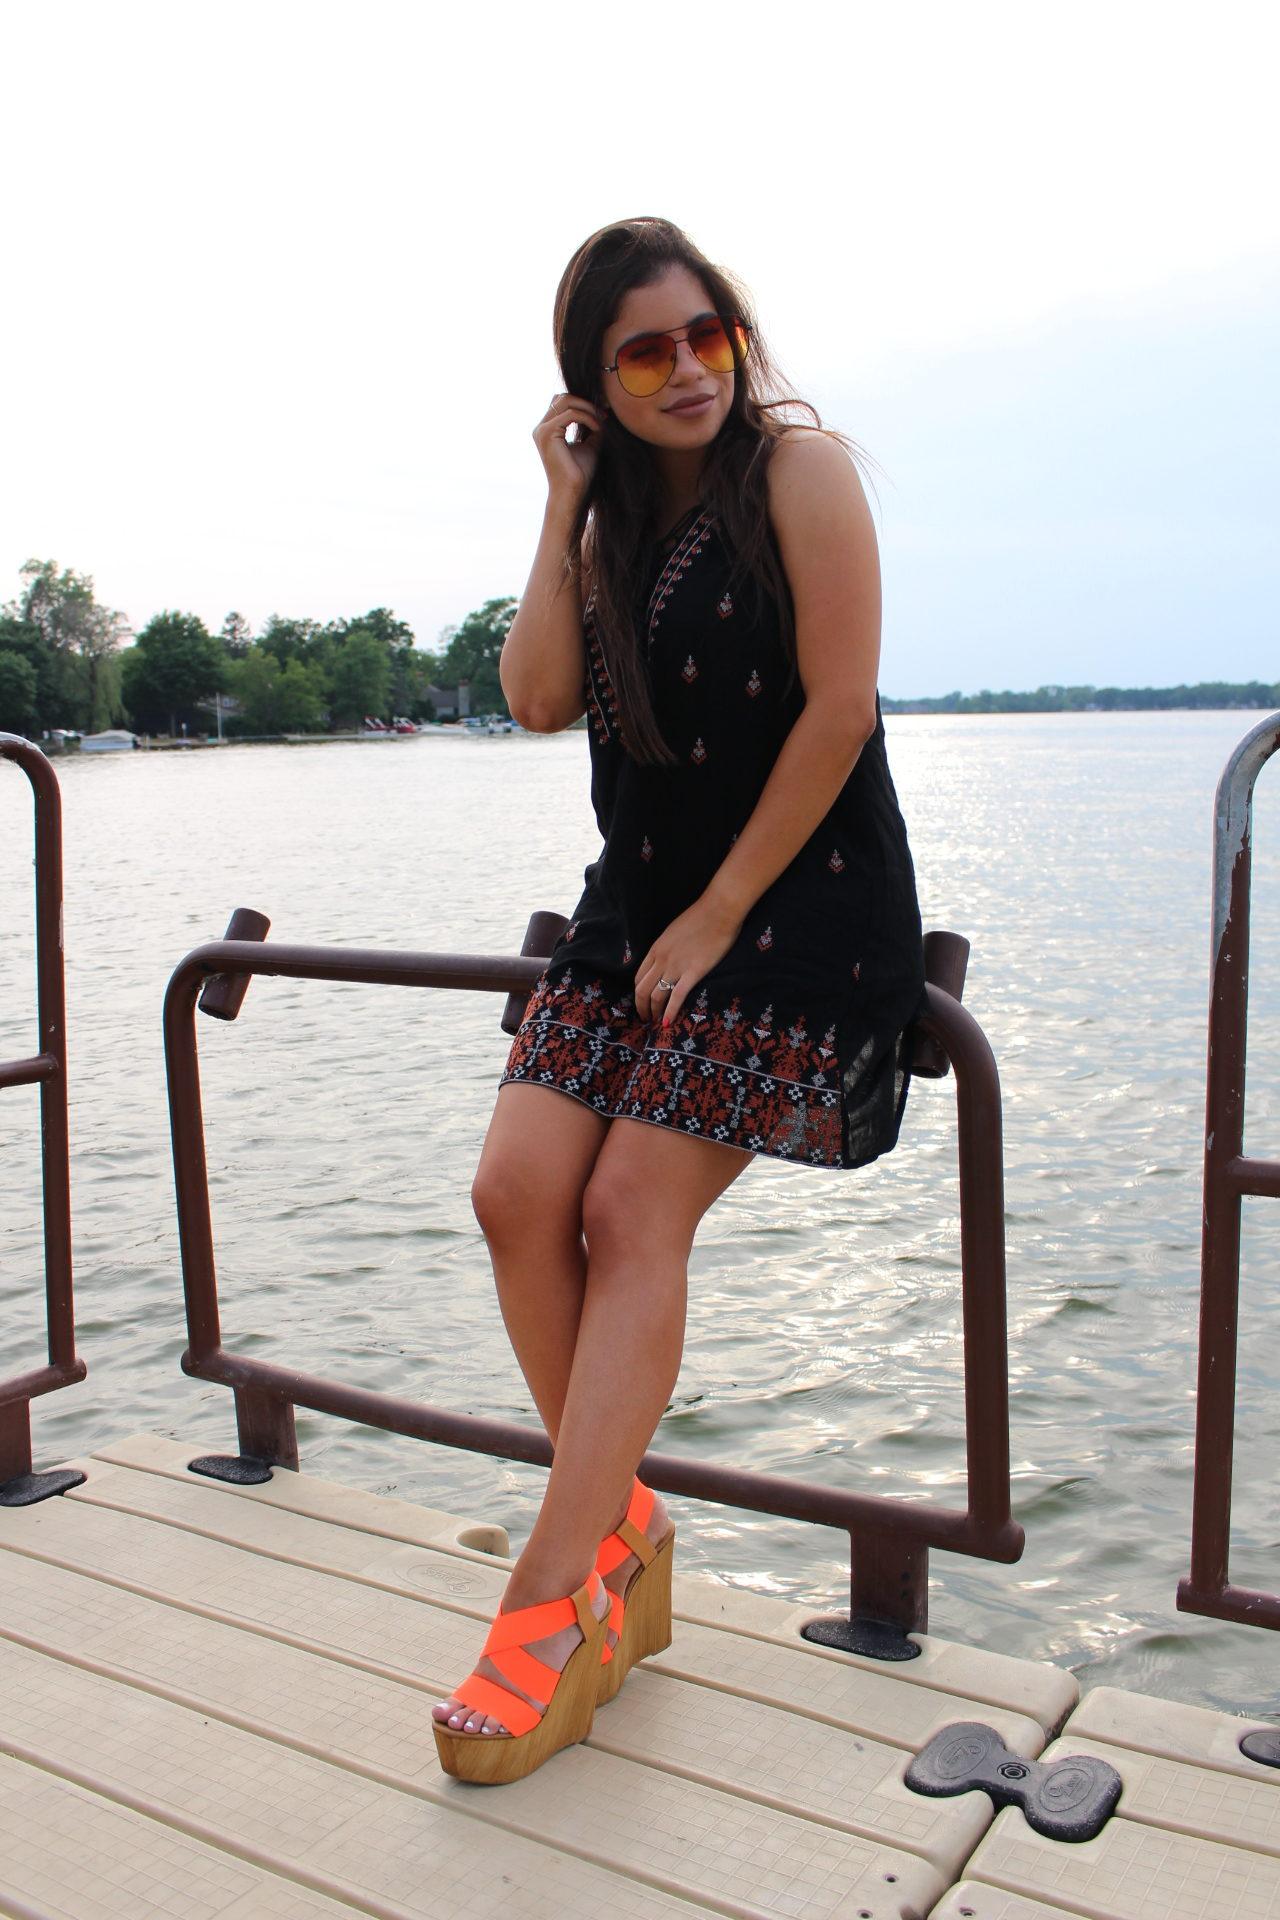 hot miami styles black babydoll OOTD steve madden wedges outfit date night short summer dress by Alejandra Avila Tufashionpetite (2)